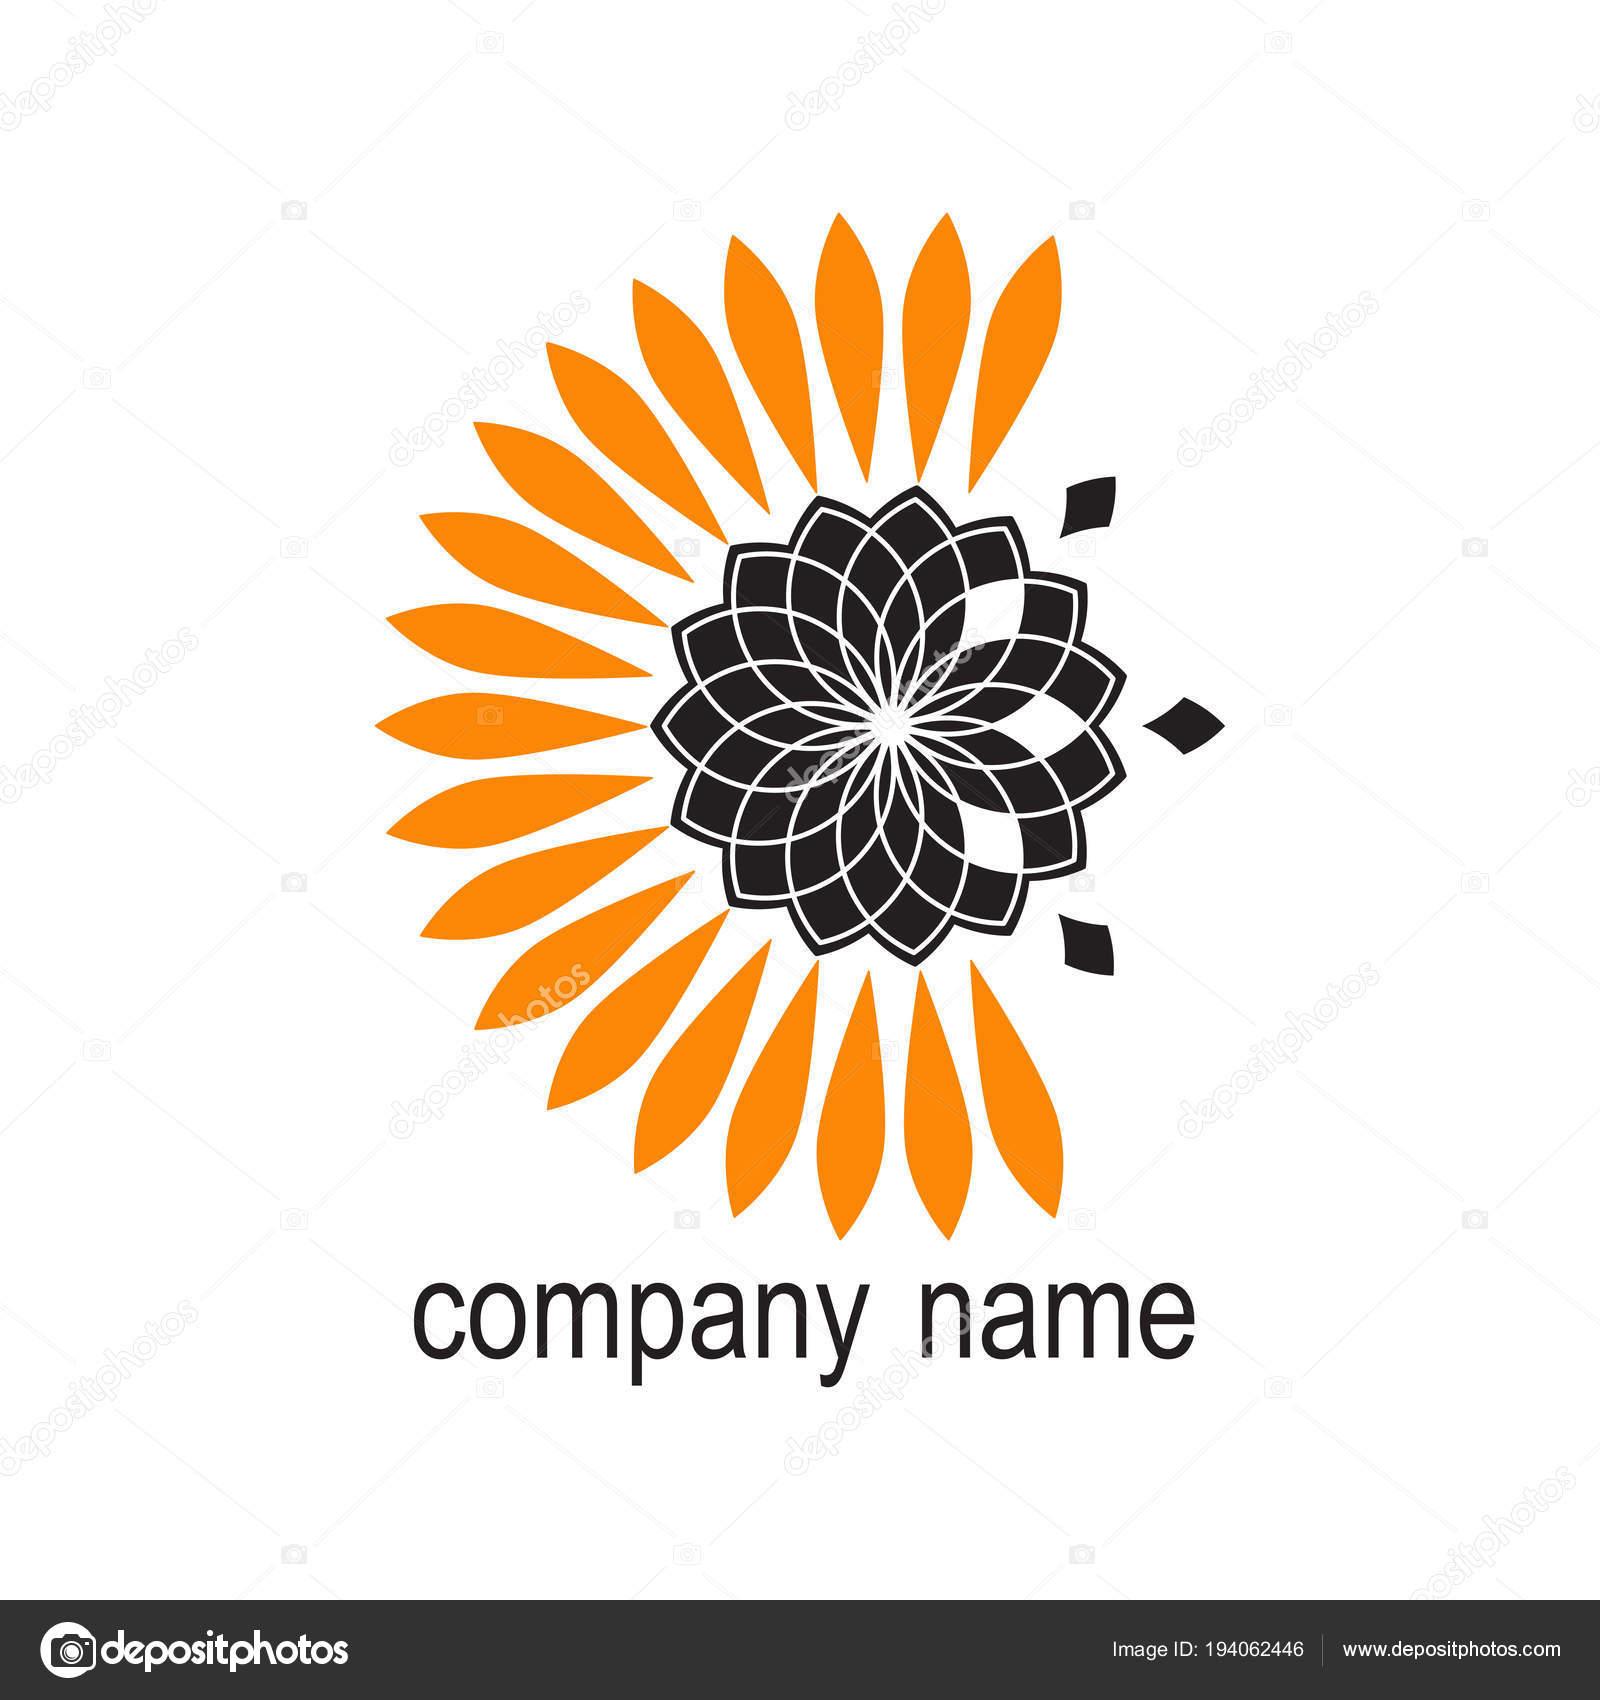 Imágenes Girasoles Con Frases Para Descargar Logotipo De